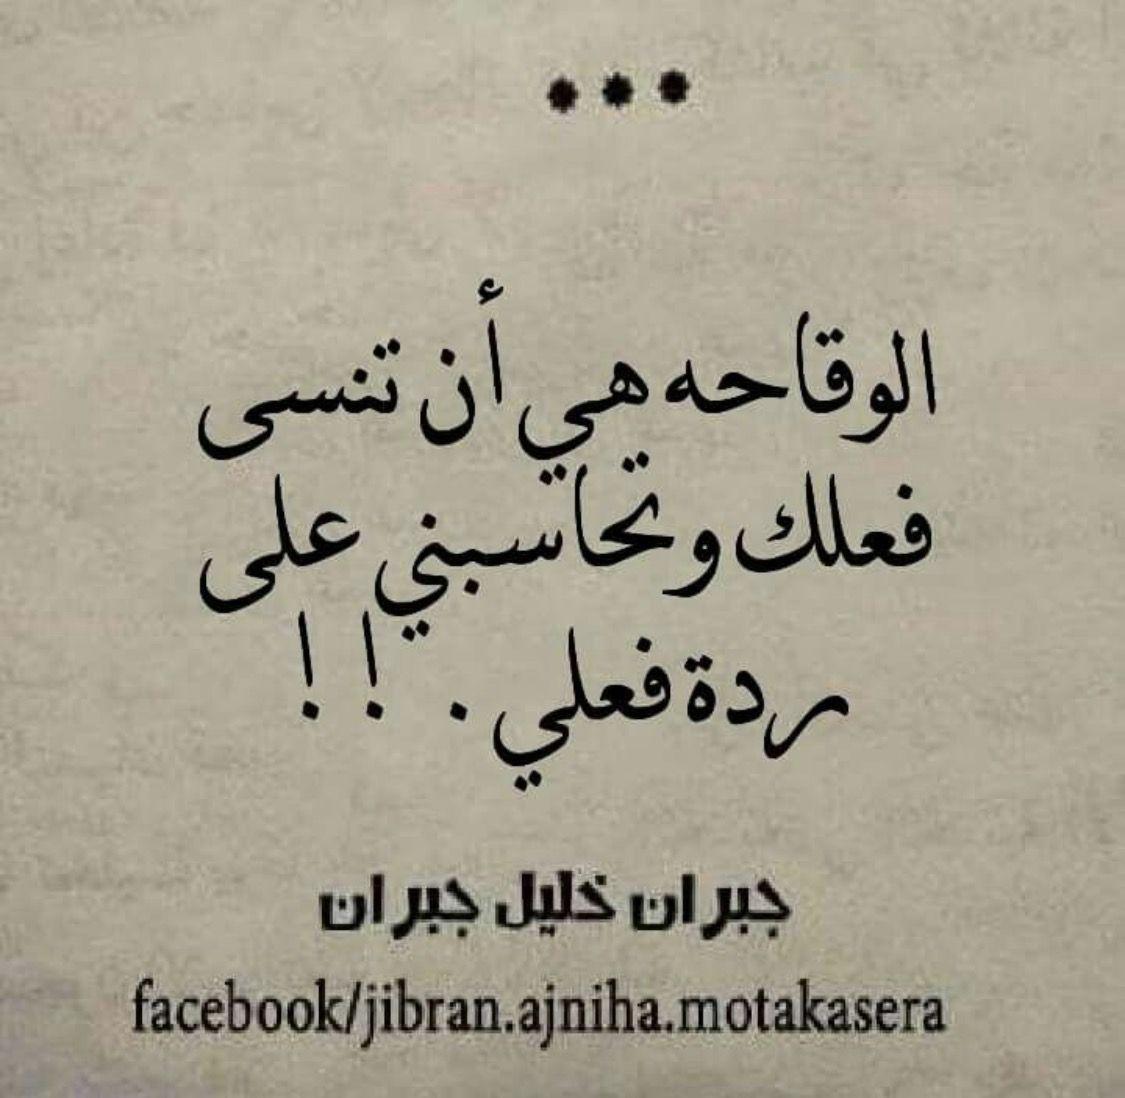 تحاسبني وتنسى فعلتك Words Quotes Talking Quotes Wisdom Quotes